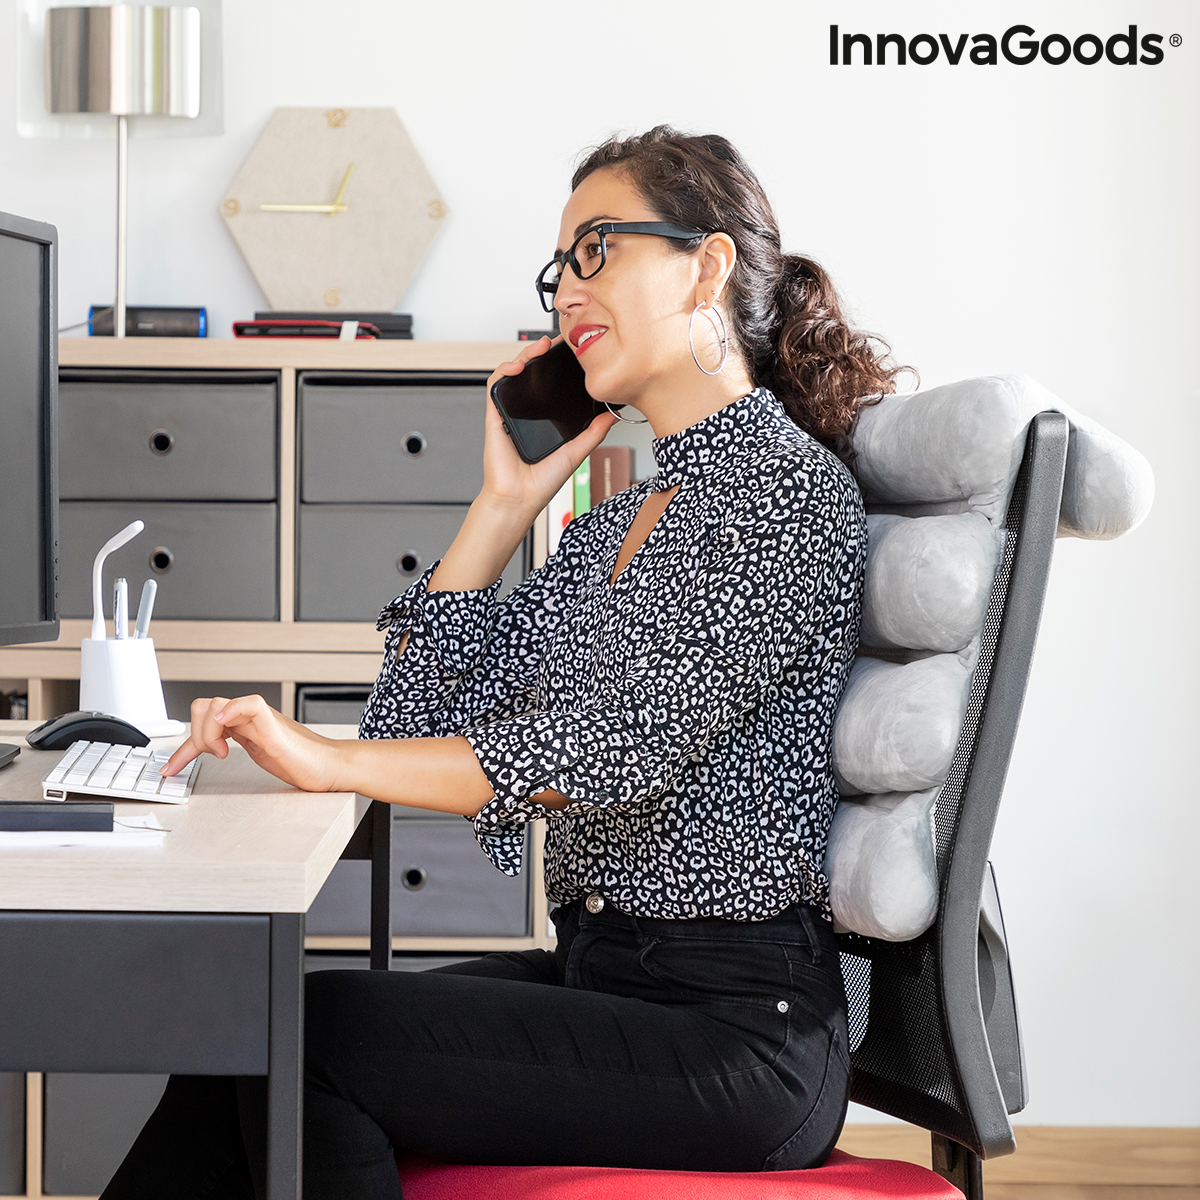 Multifunctional Modular Pillow Rollow InnovaGoods